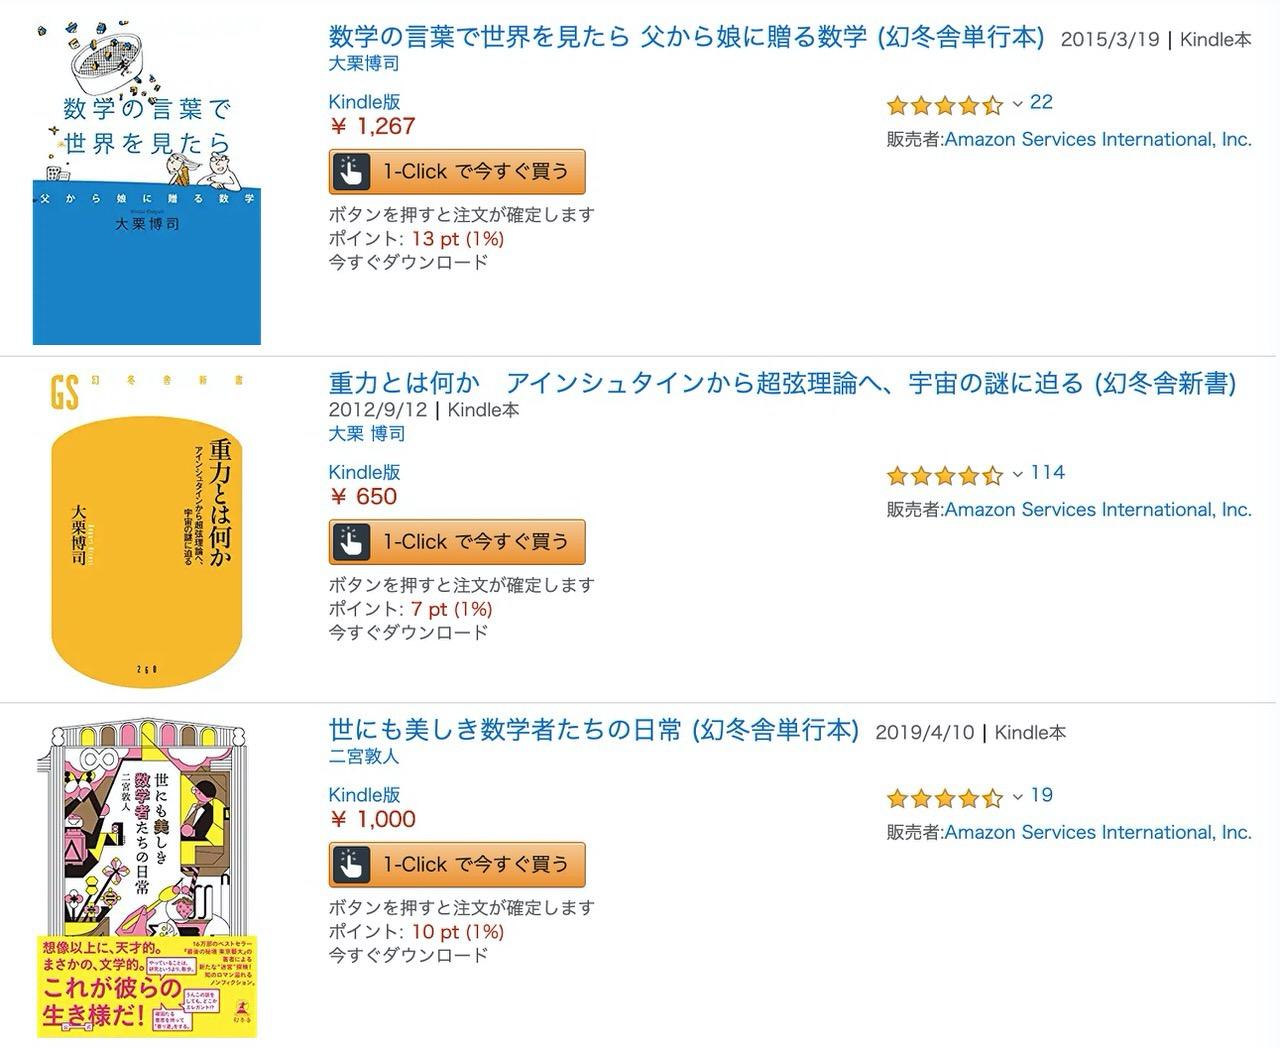 【Kindleセール】「科学っておもしろい!わが子に教えたい身近な不思議」セール(3/19まで)